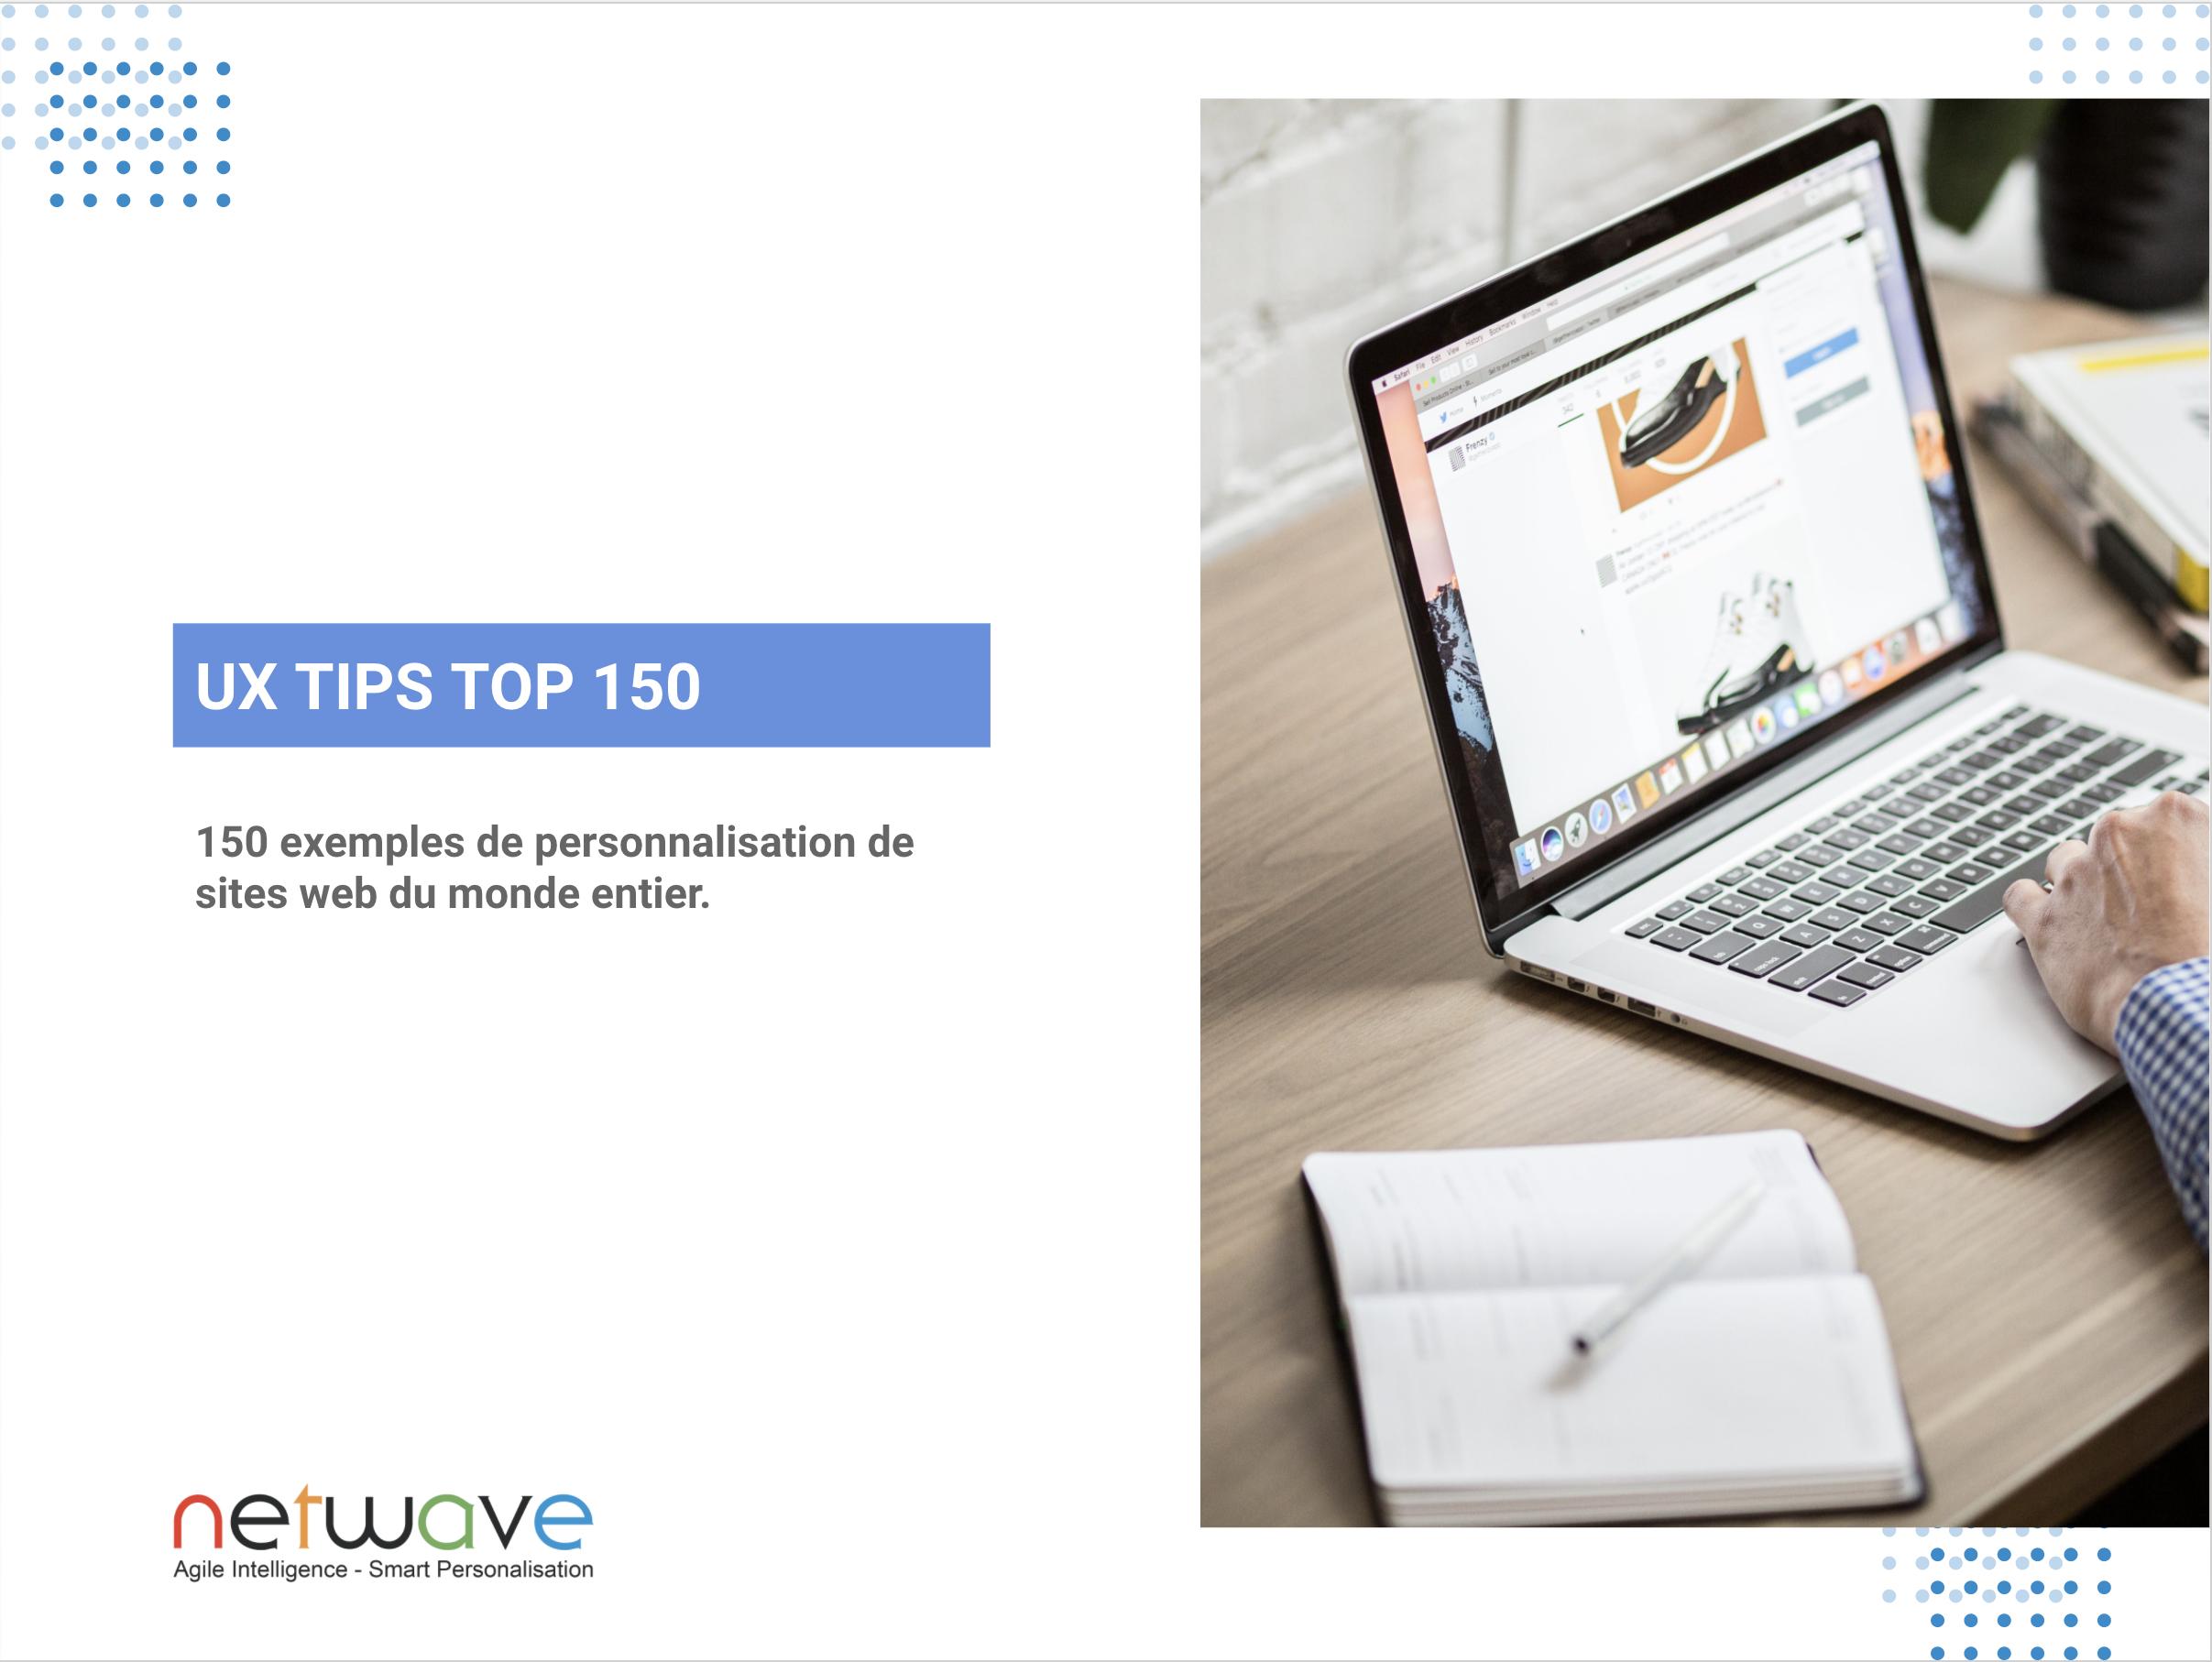 uxtips-top-150-personnalisation-netwave